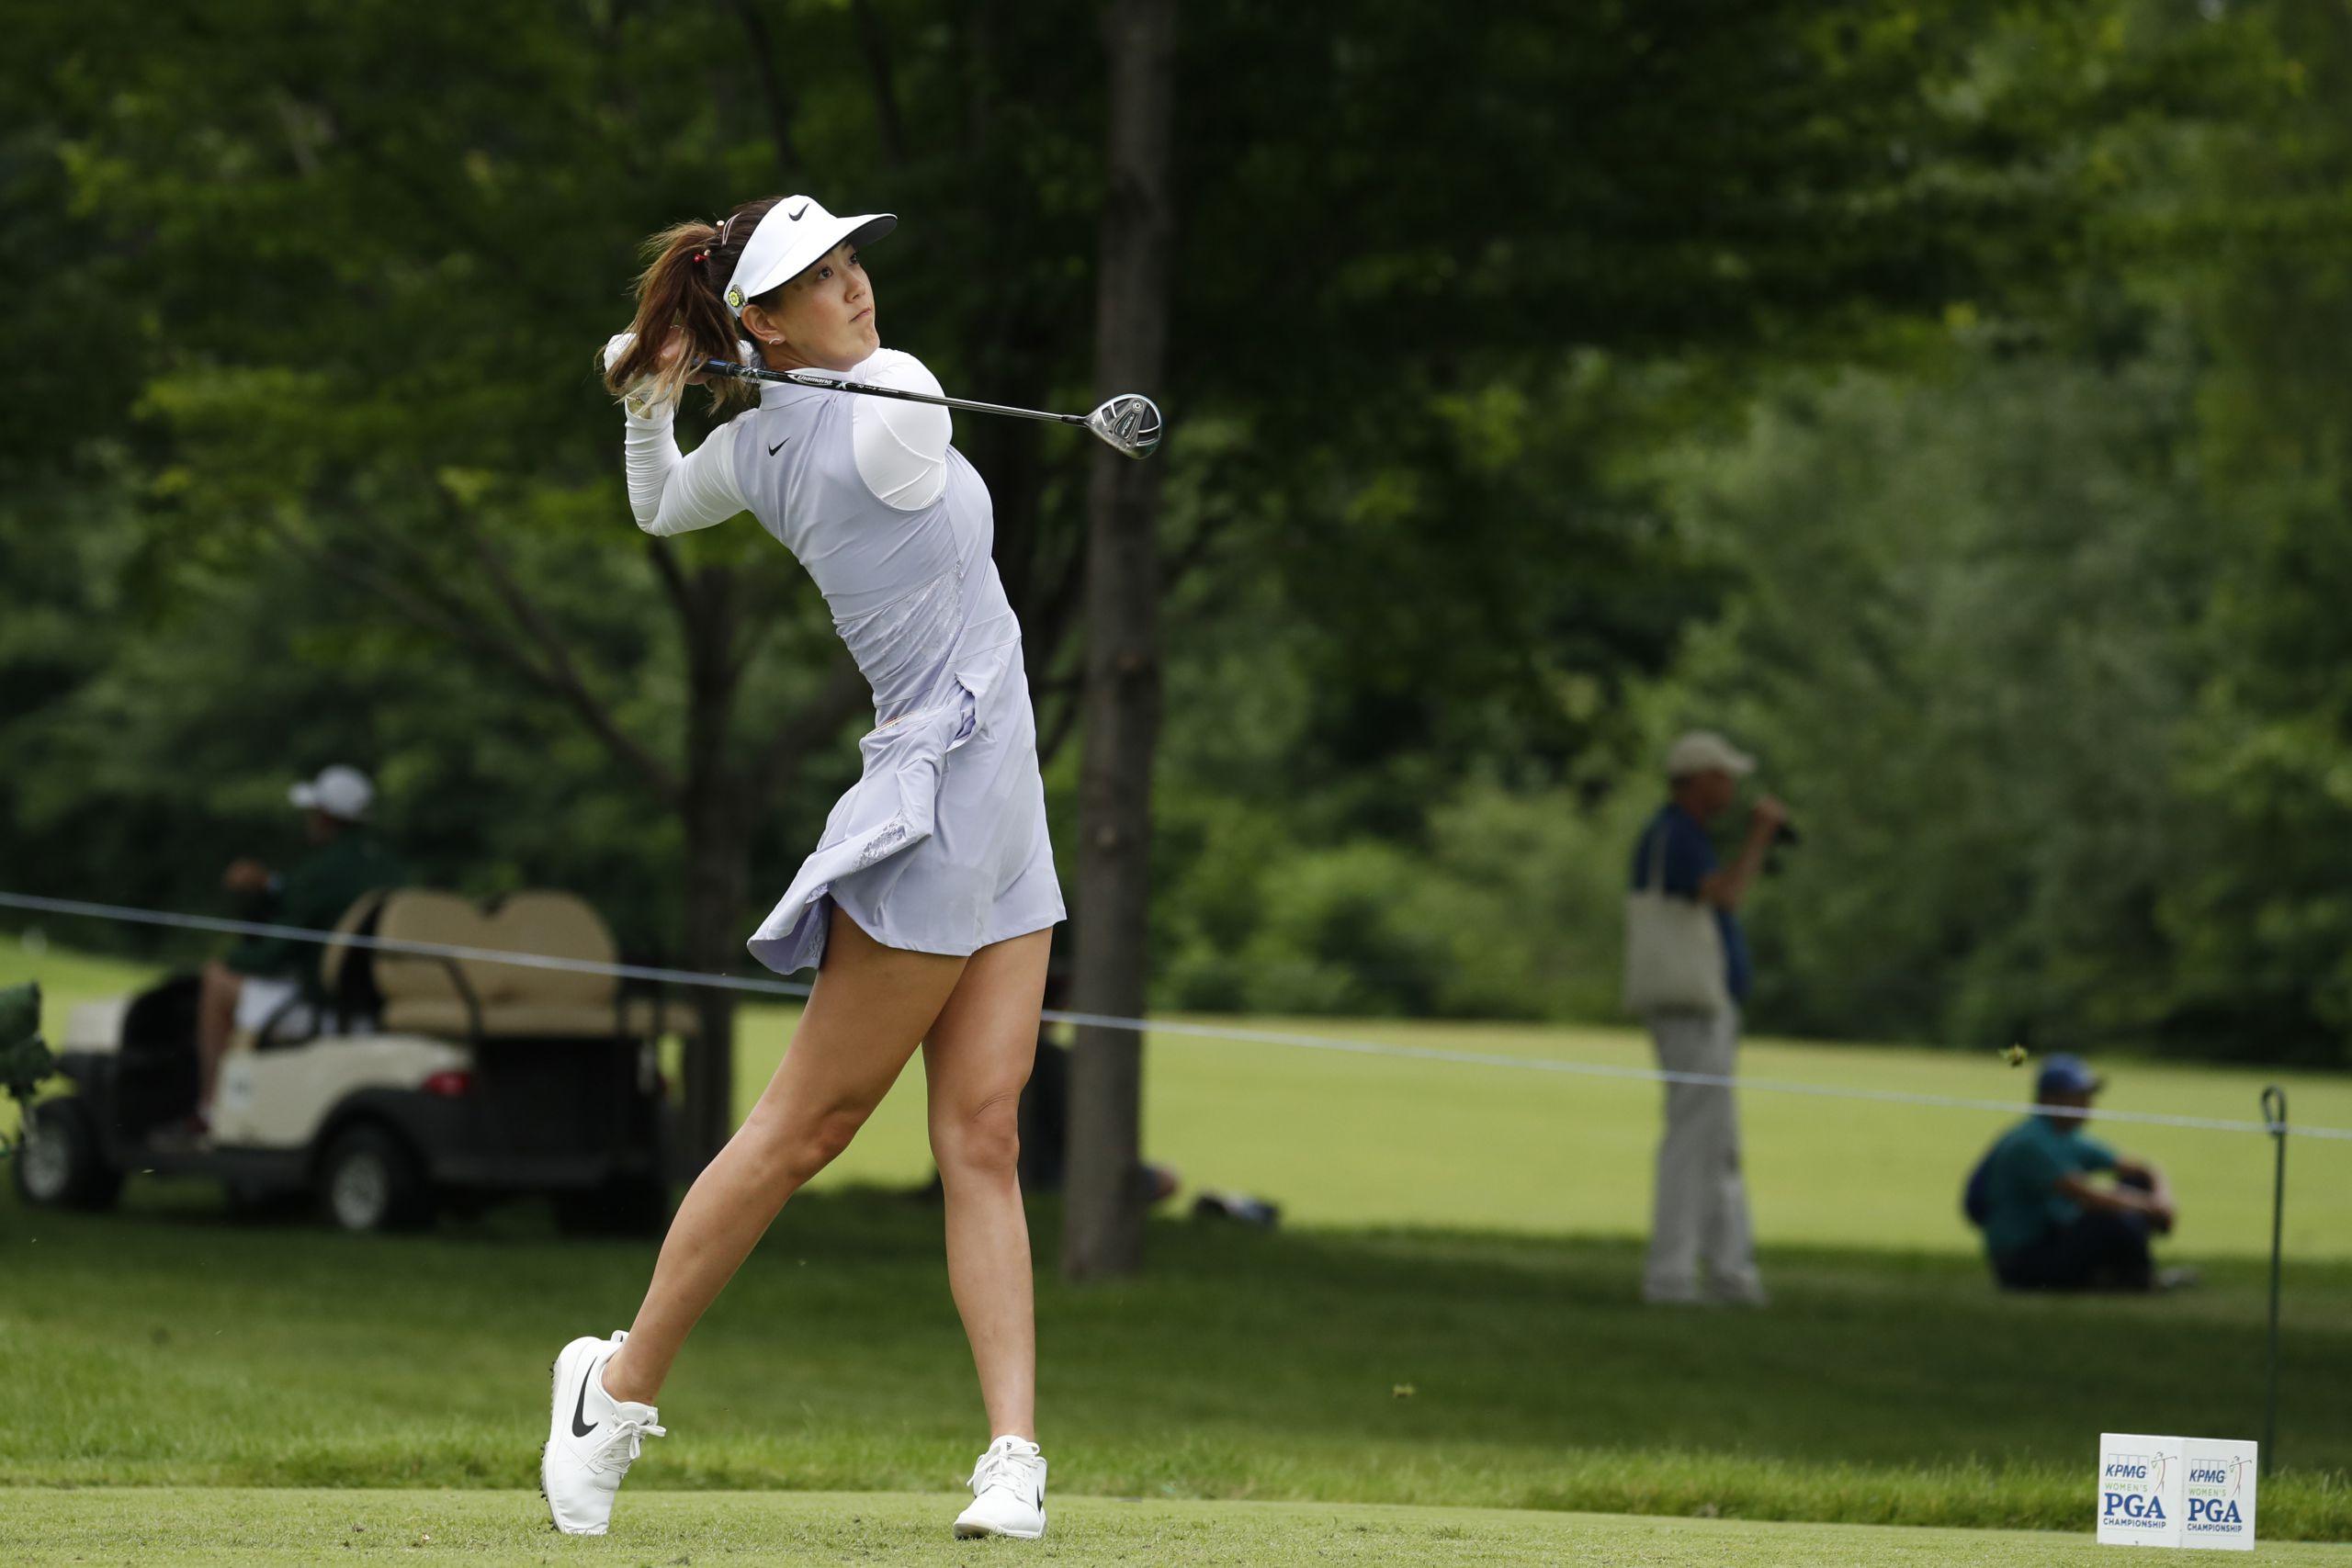 lpga-usga-female-sports